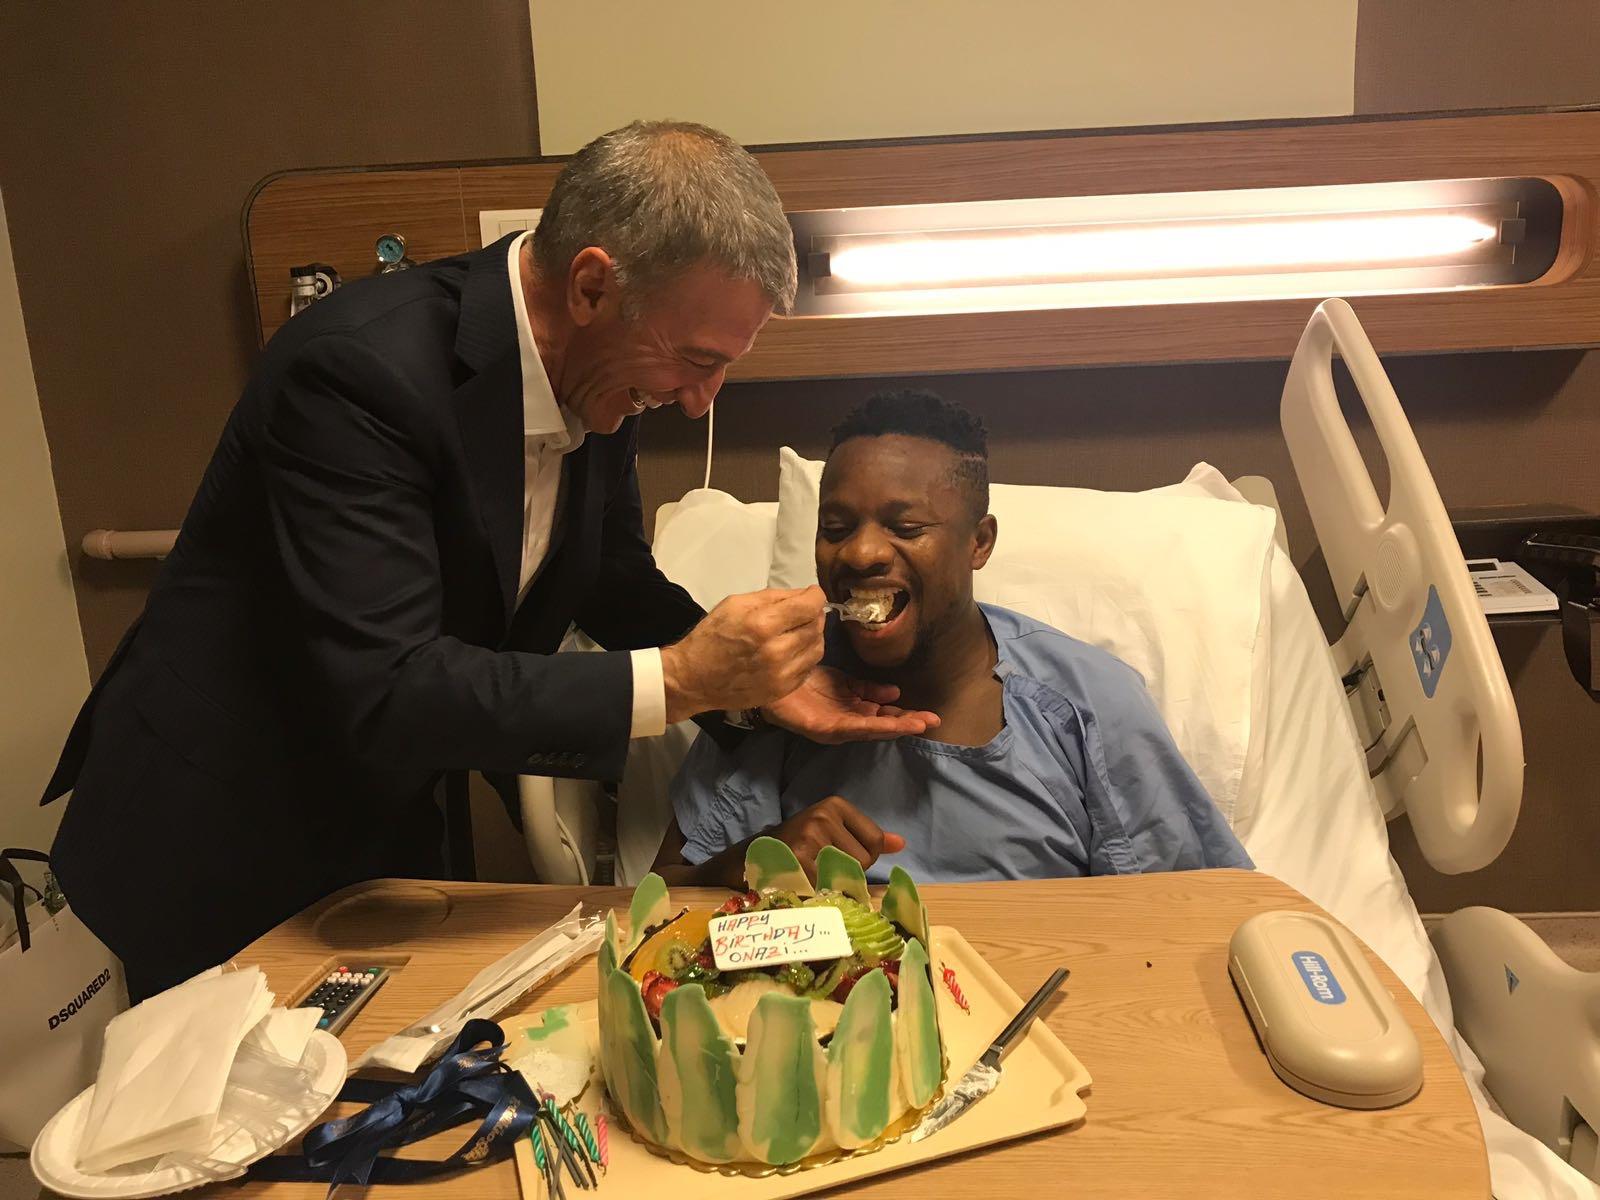 Trabzonspor's President celebrates Onazi at 26 on hospital bed